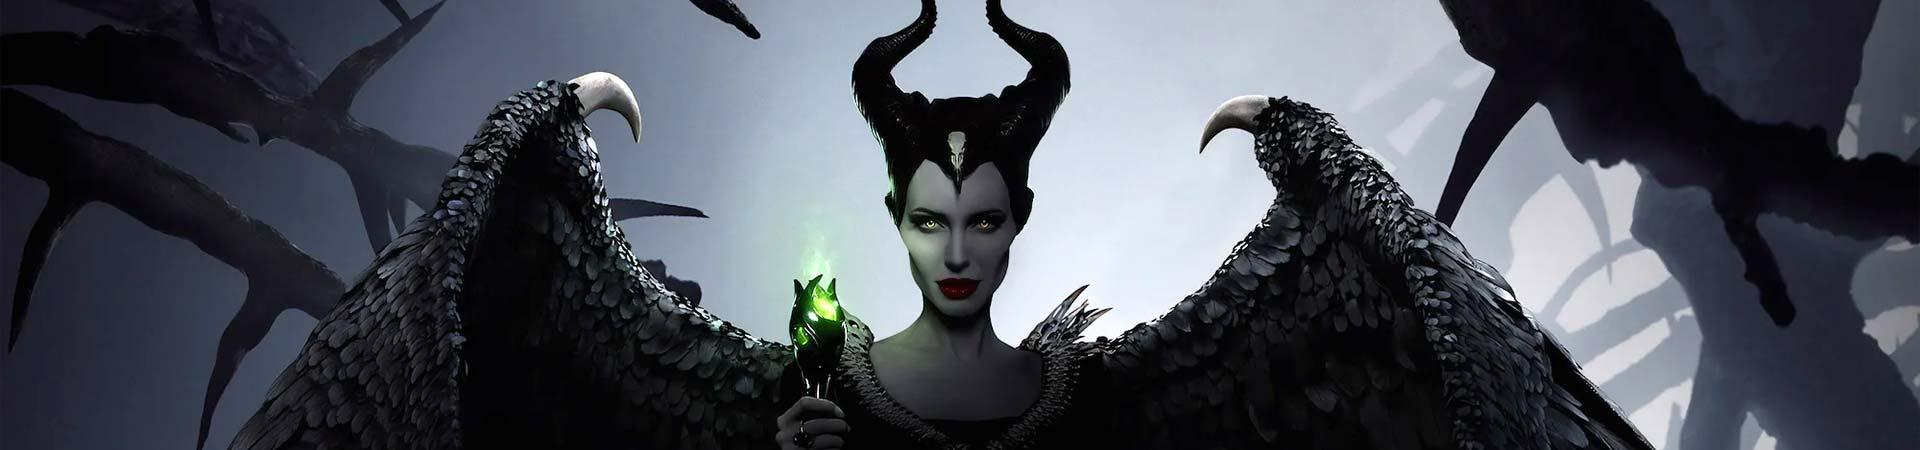 MainSlider-MaleficentMistressOfEvil